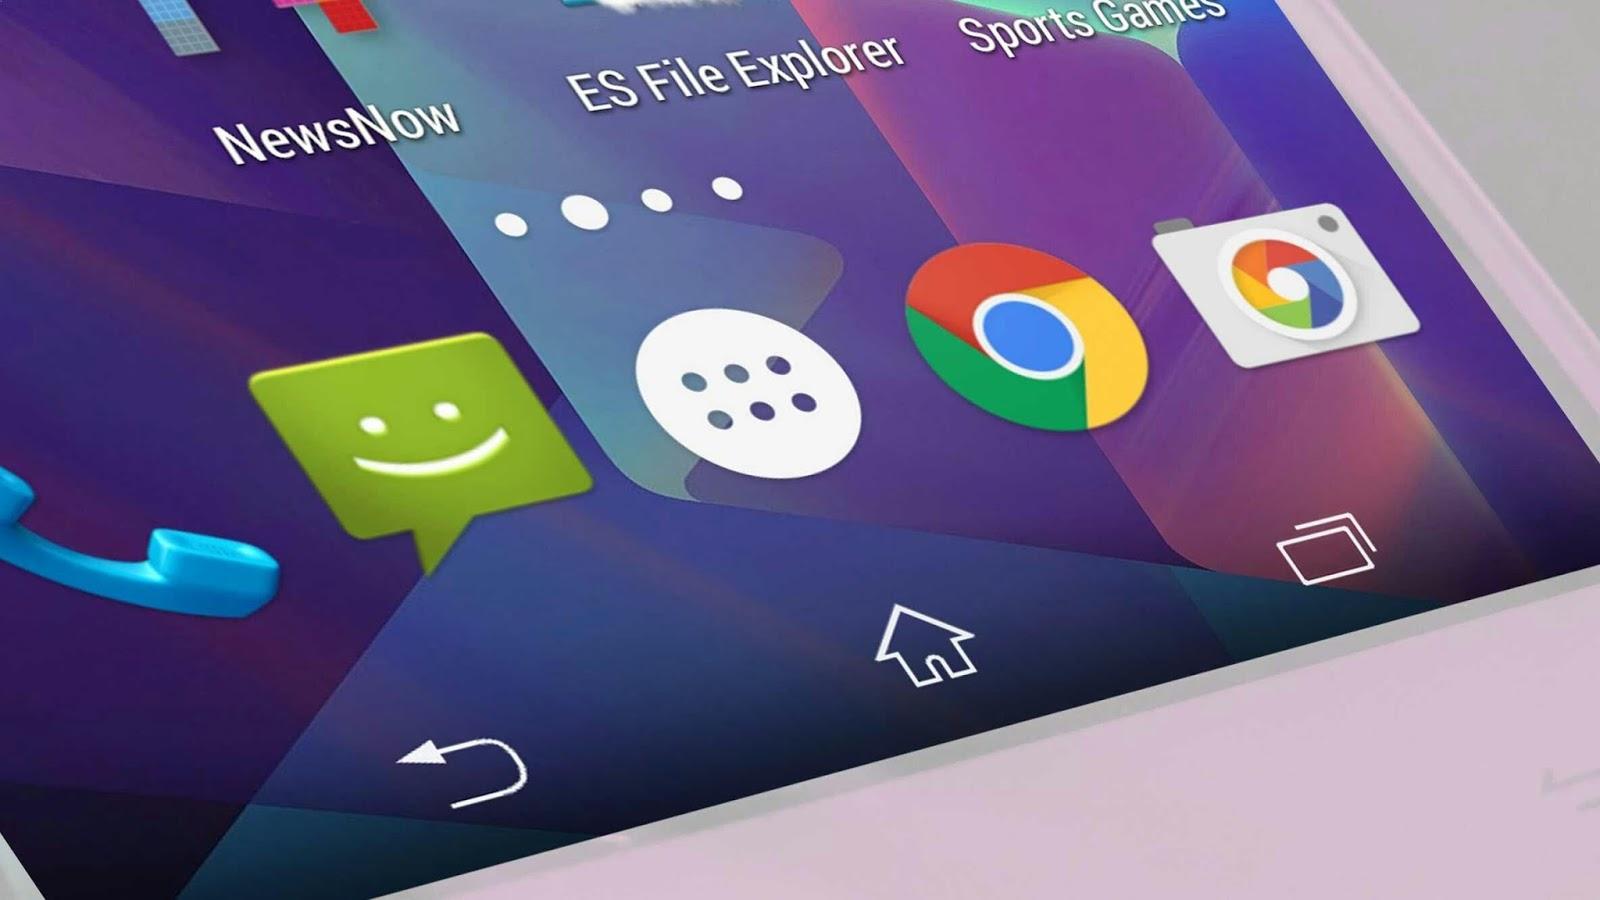 Cara menambahkan virtual navbar di Android tanpa root Cara Menggunakan Simple Control di Android